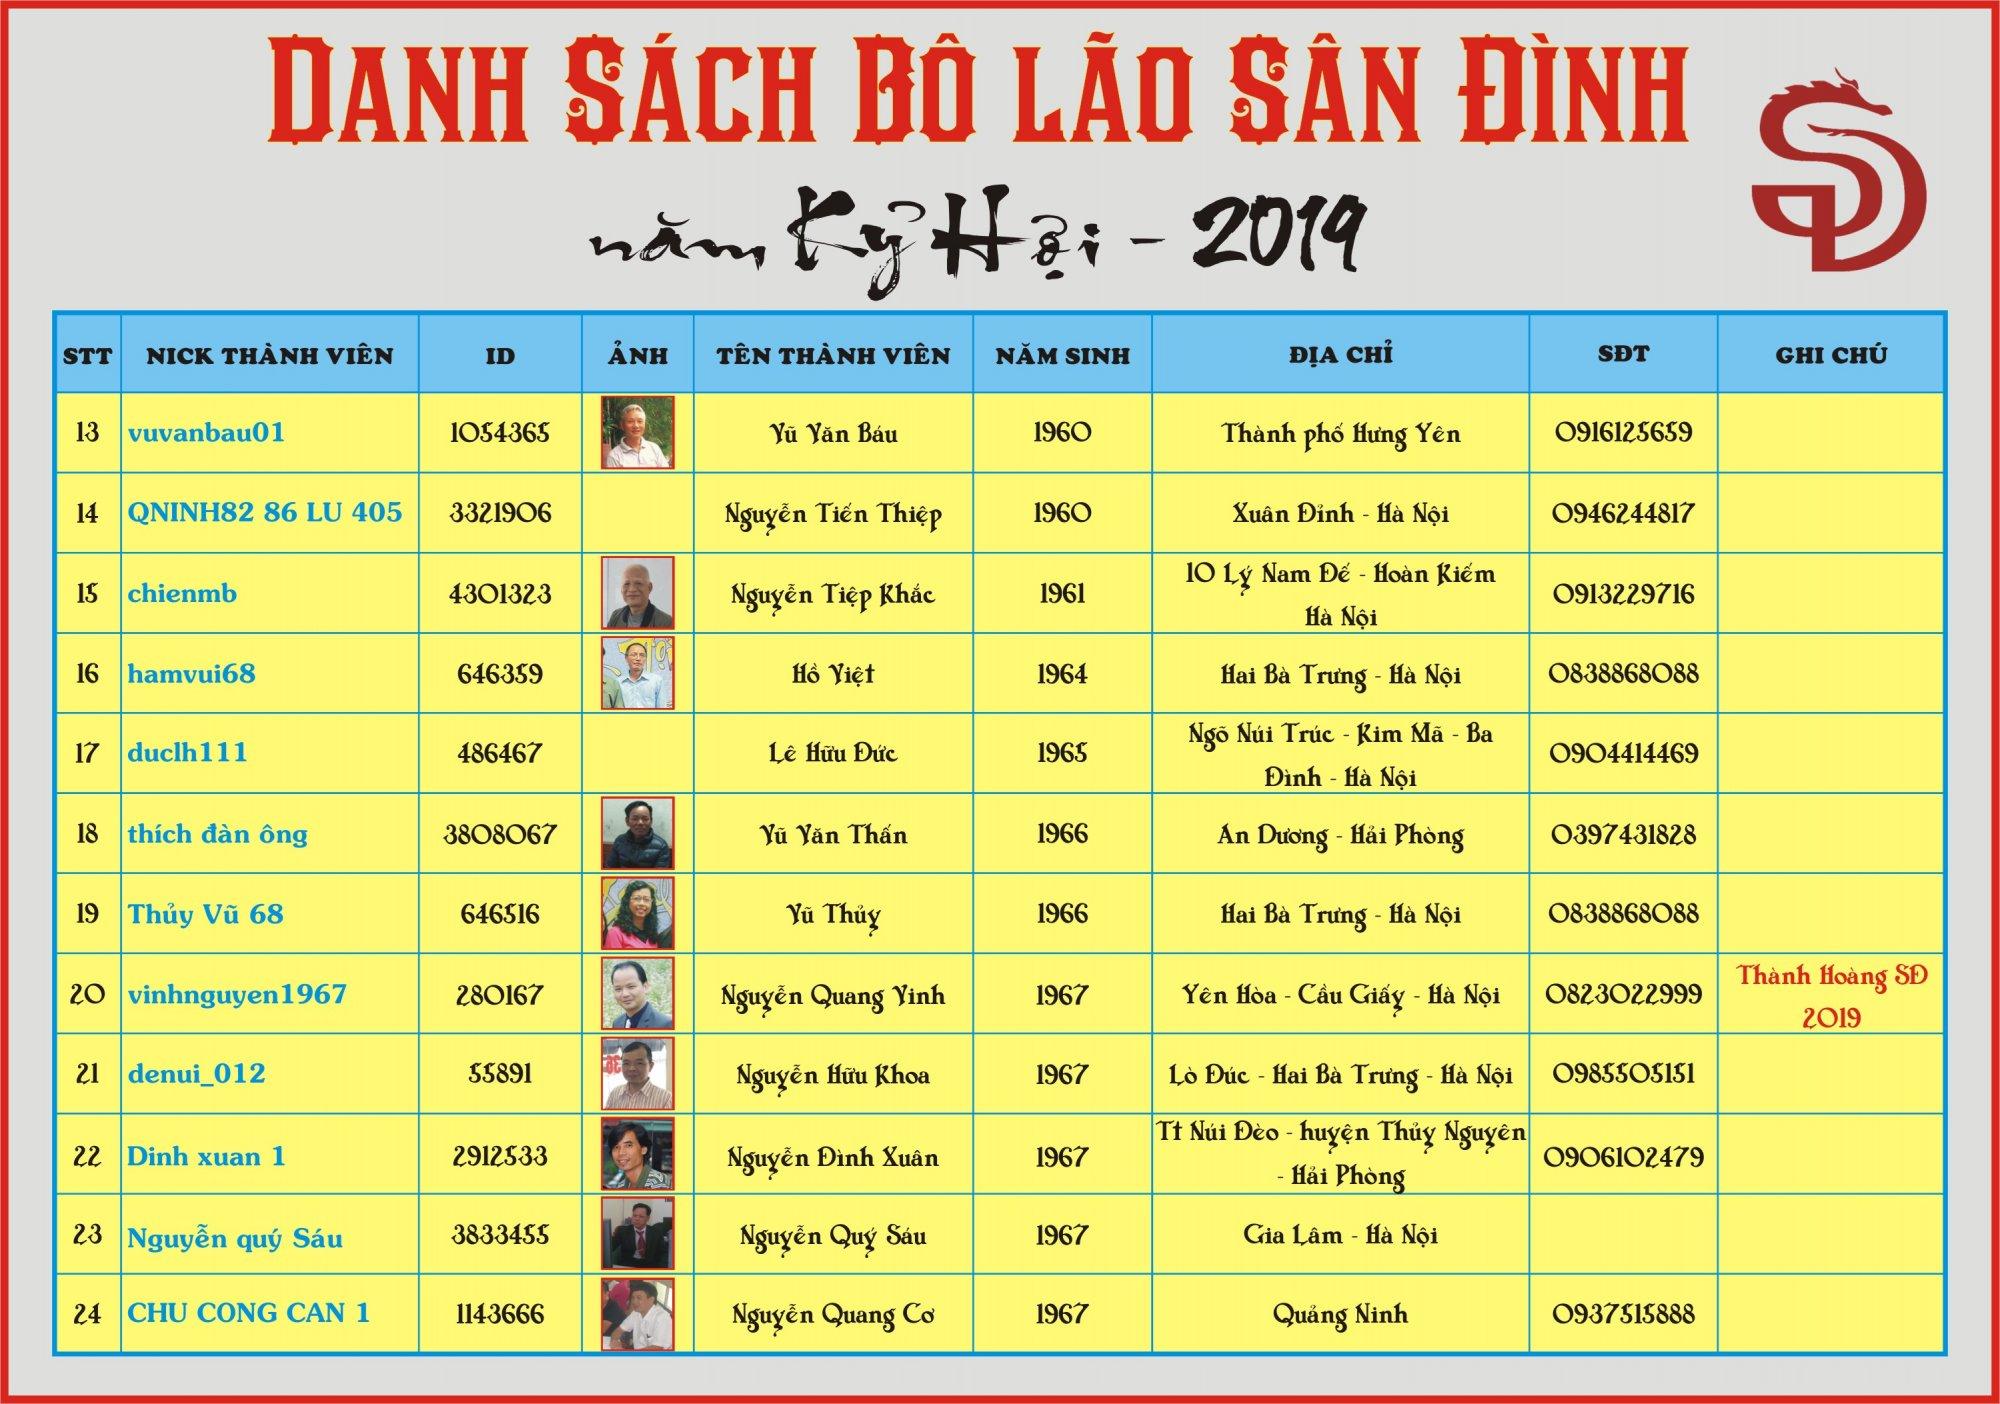 DS Bo lao SD_2019.12.14 (2).JPG